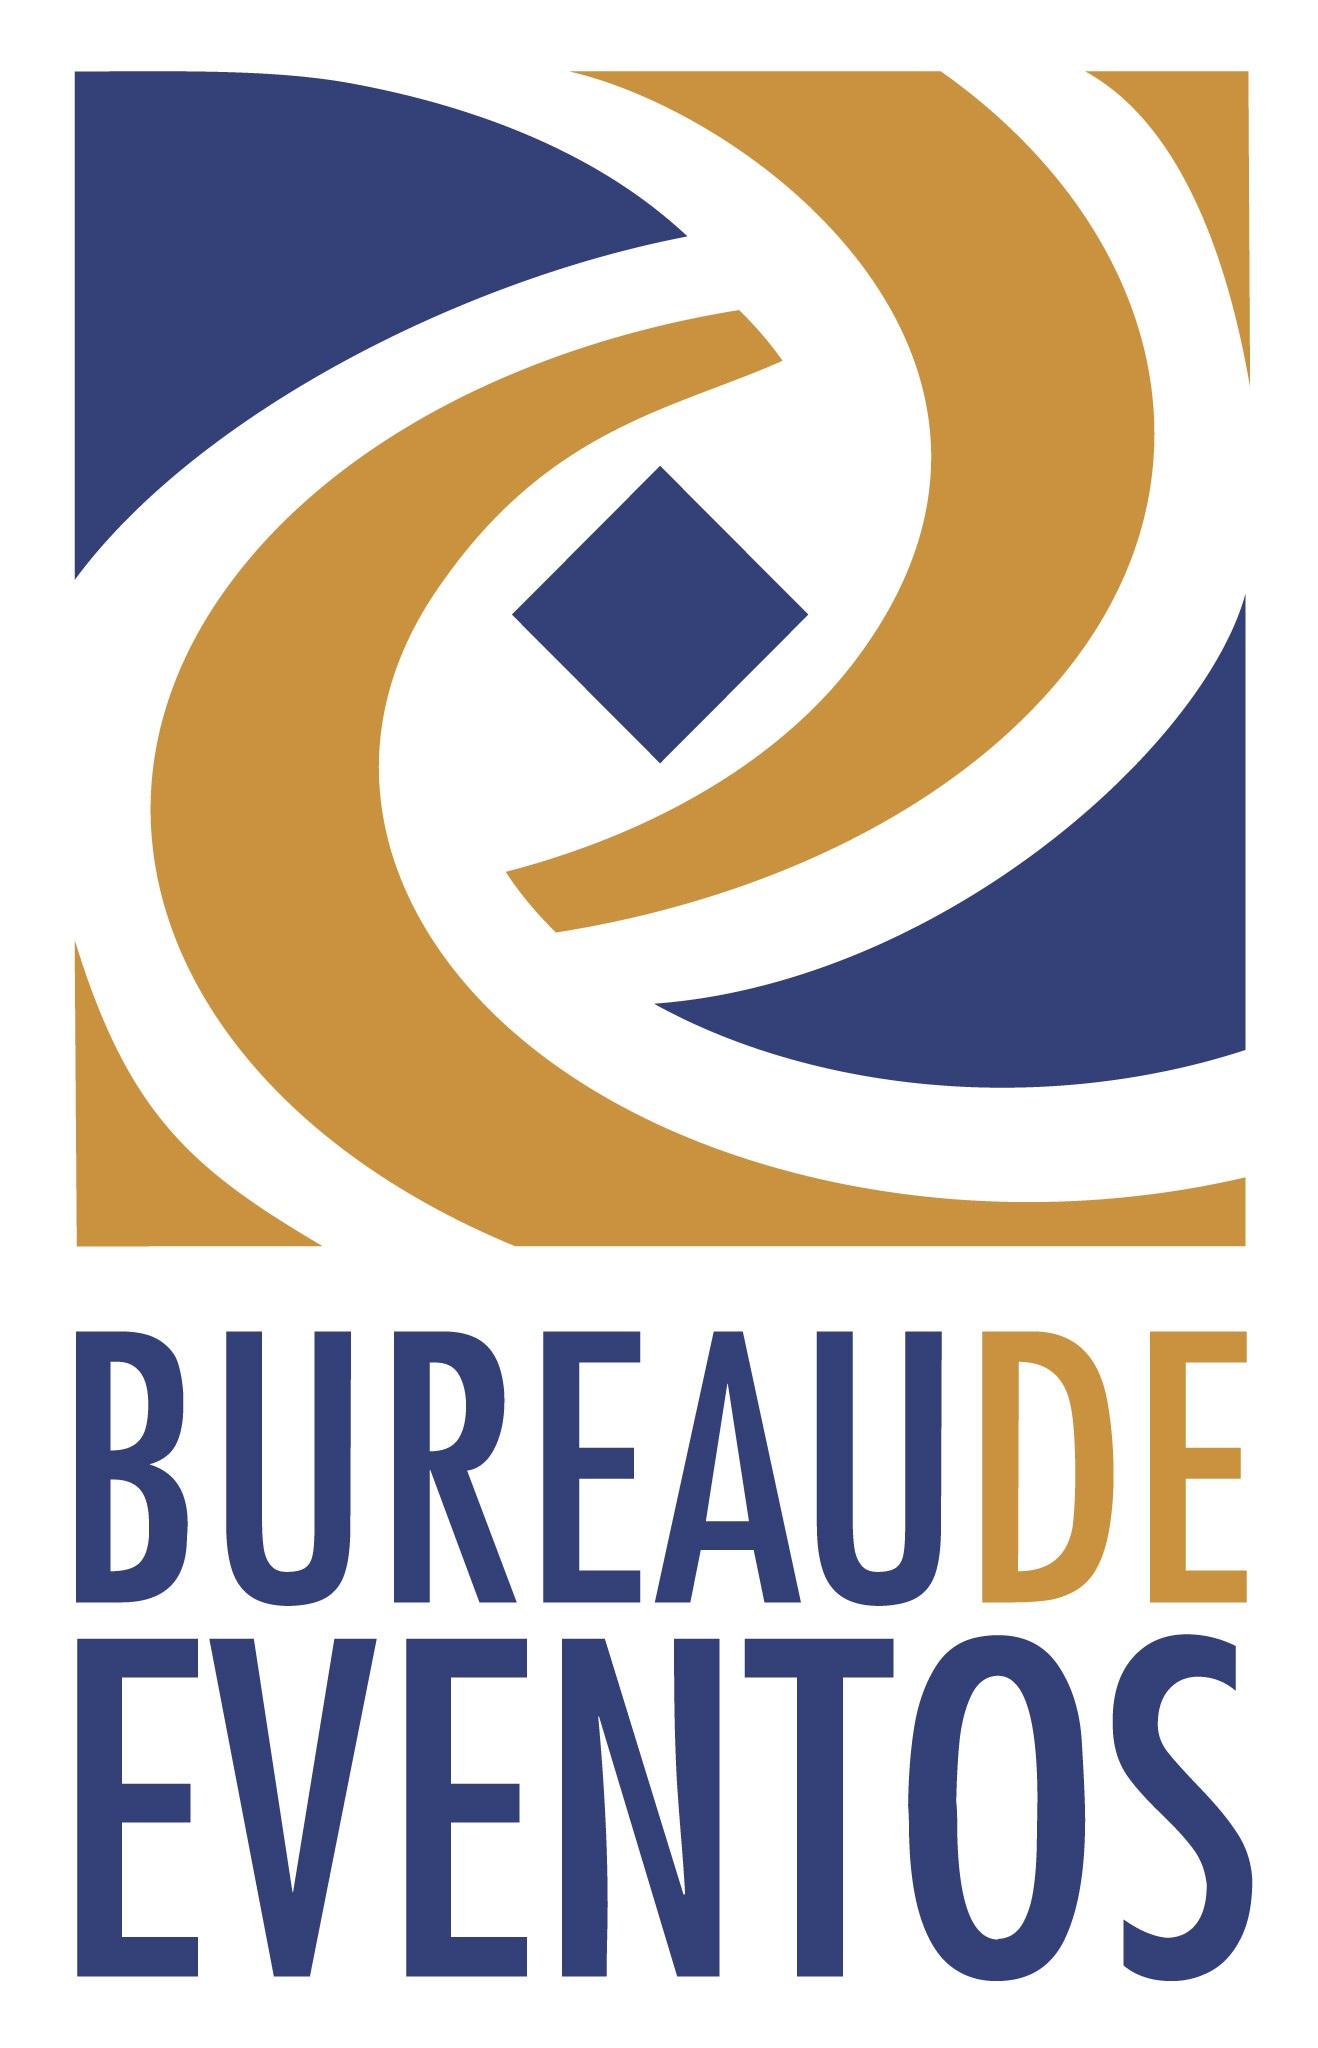 Bureau_de_eventos_-logomarca